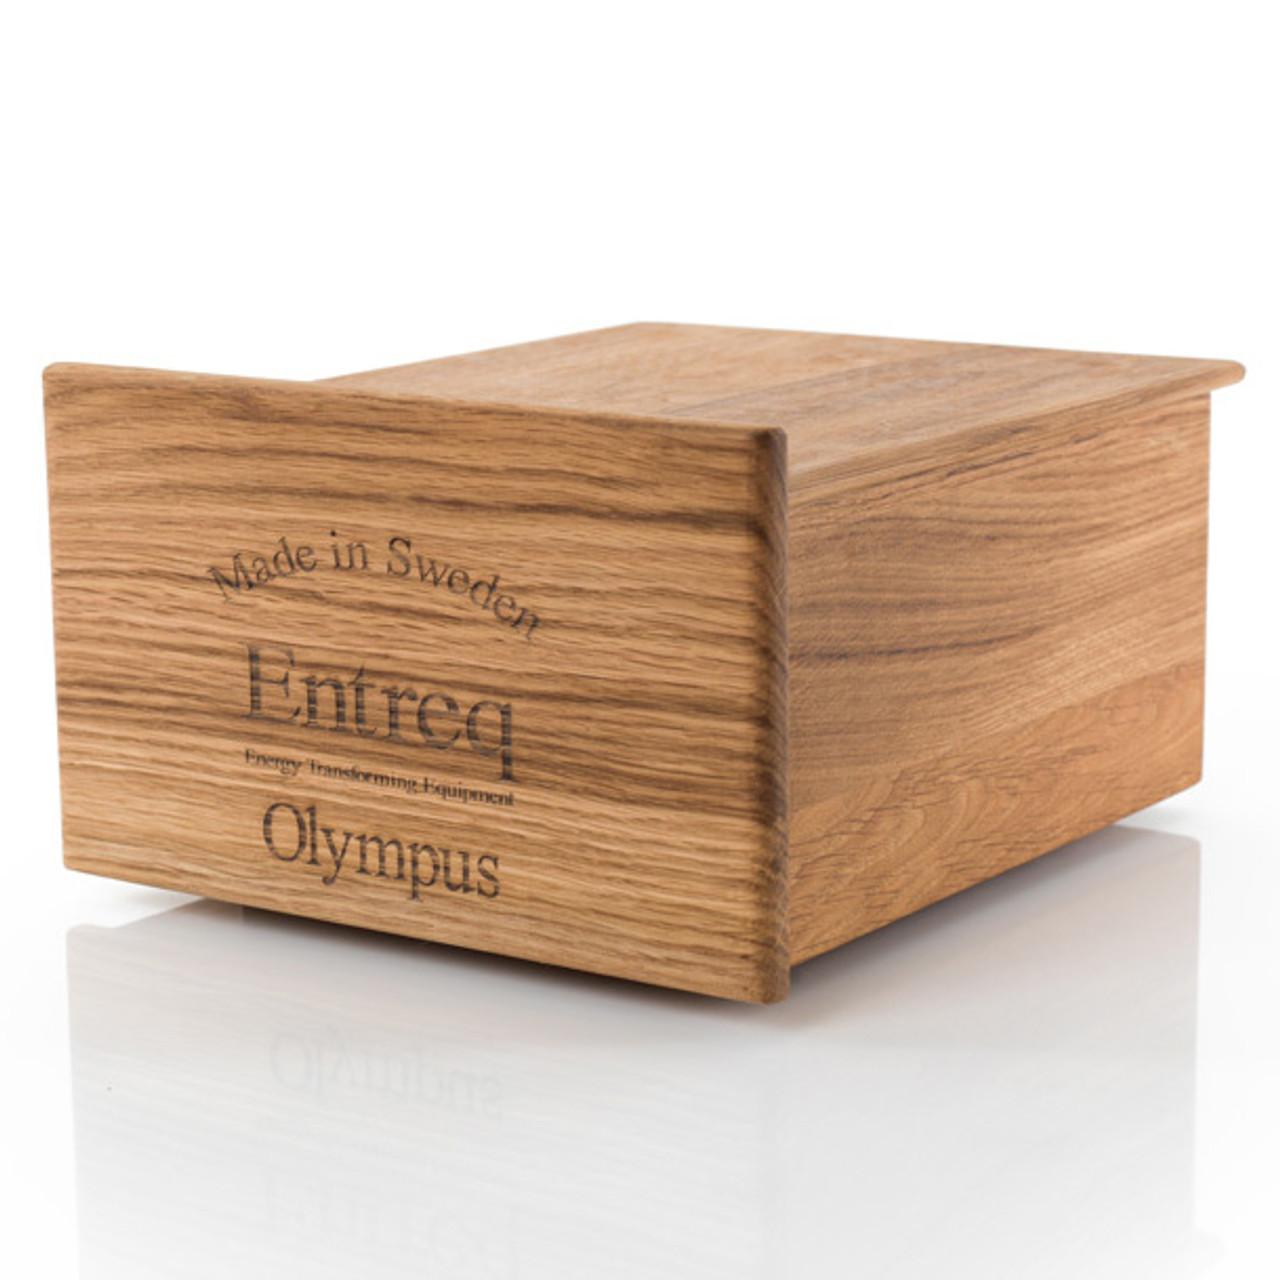 Entreq Olympus Infinity Ground Conditioner